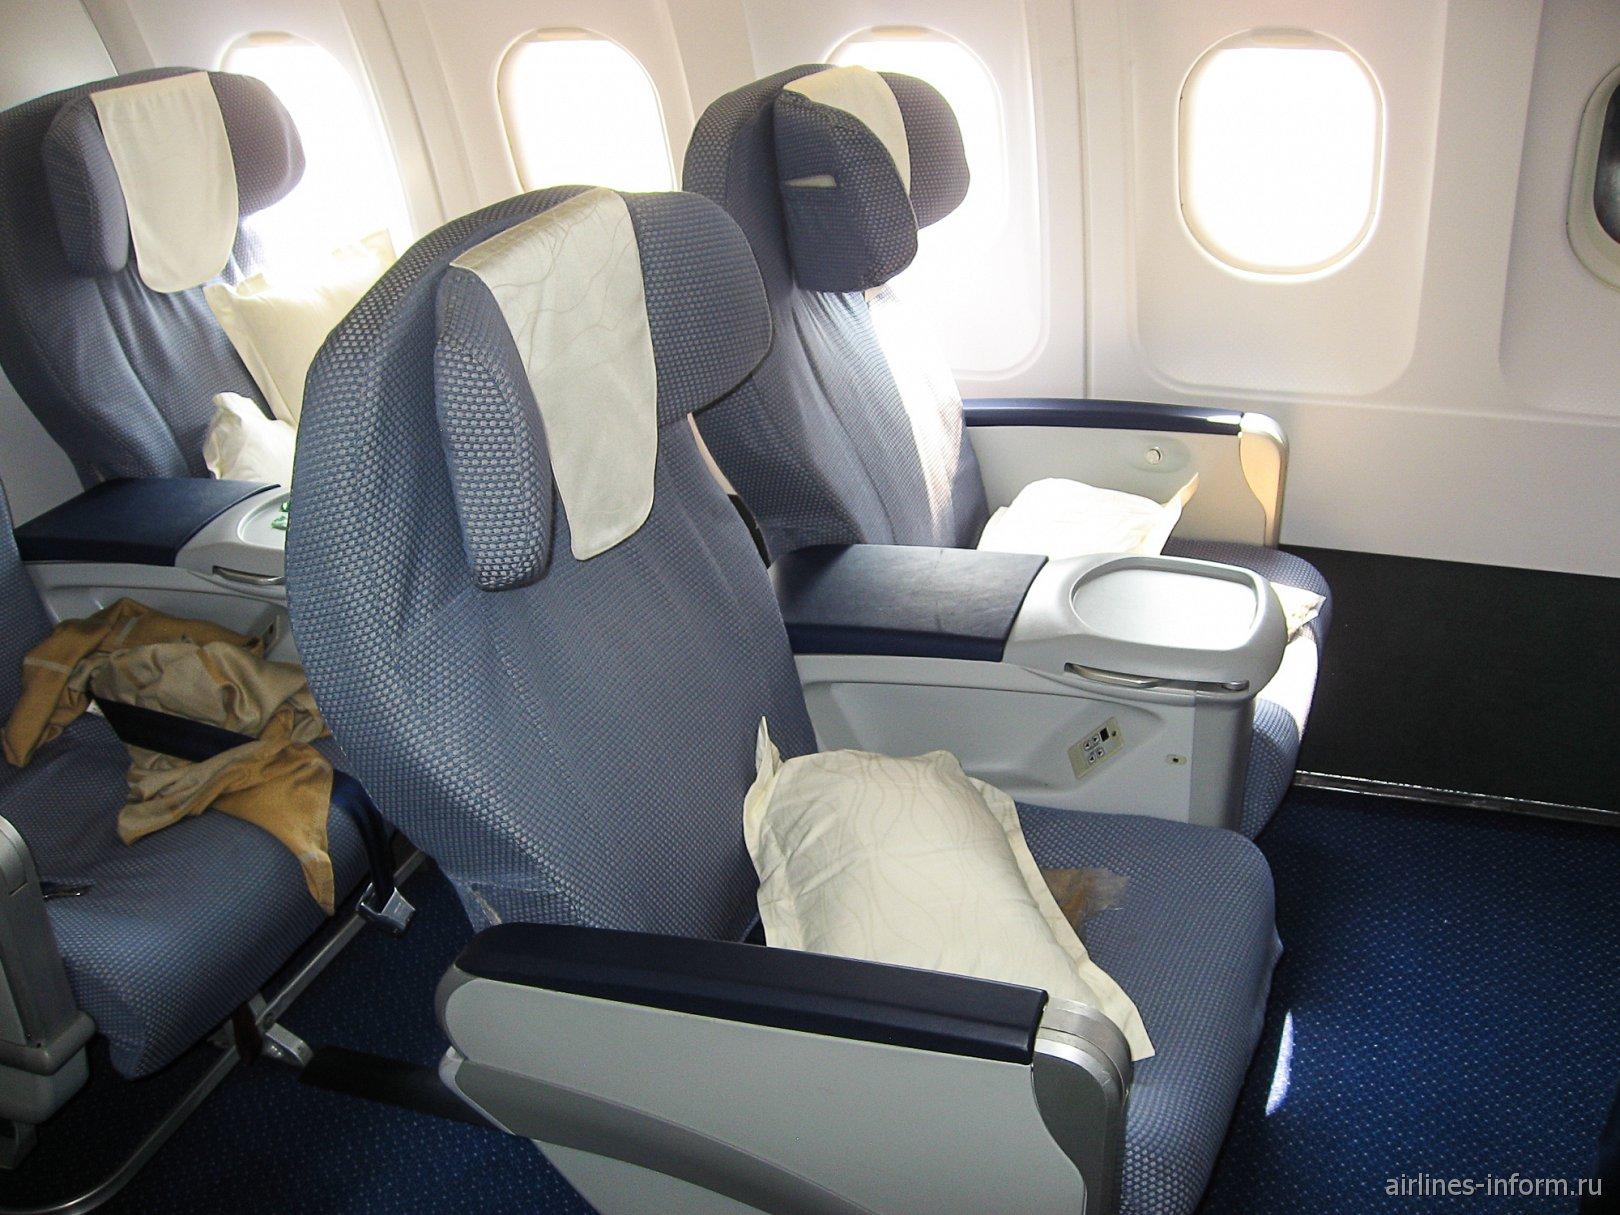 Бизнес-класс в Airbus A320 авиакомпании China Southern Airlines